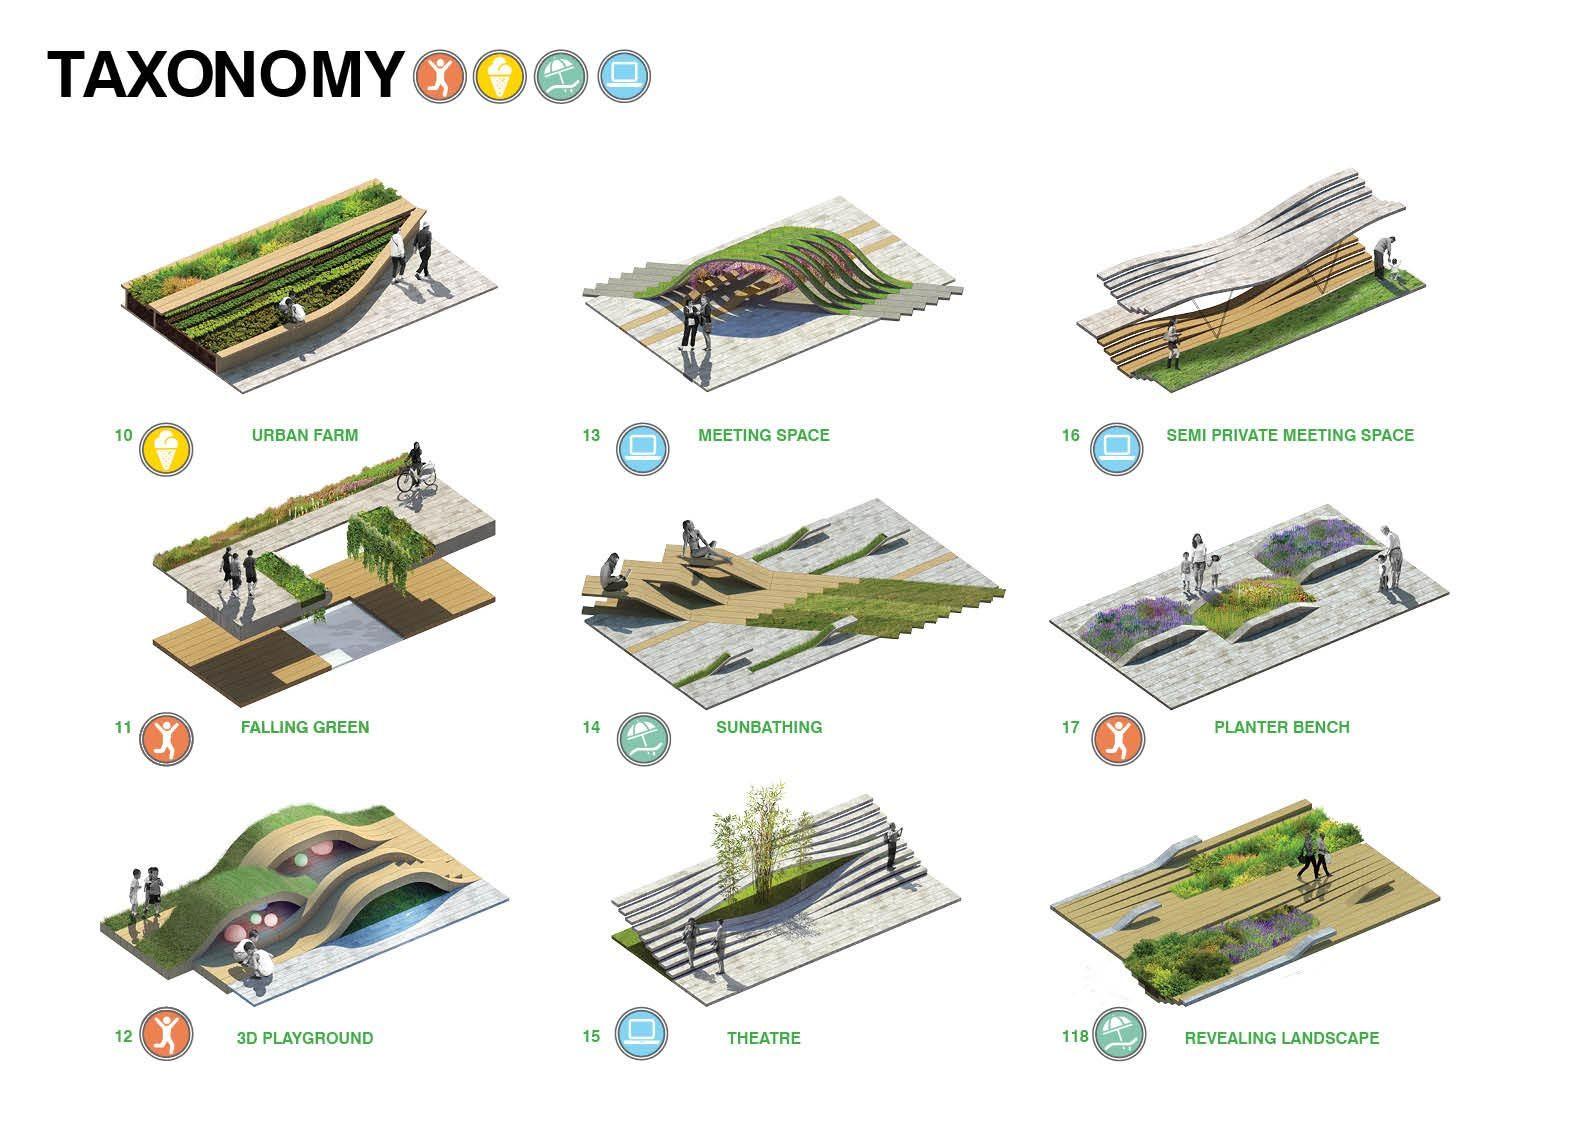 Seun, high line in Korea, 3d print landscape, urban planning, retrofit, factory rehab, seoul, greenwalk, elevated park, sustainable design, architecture, hipster, business evolution is part of Landscape diagram -